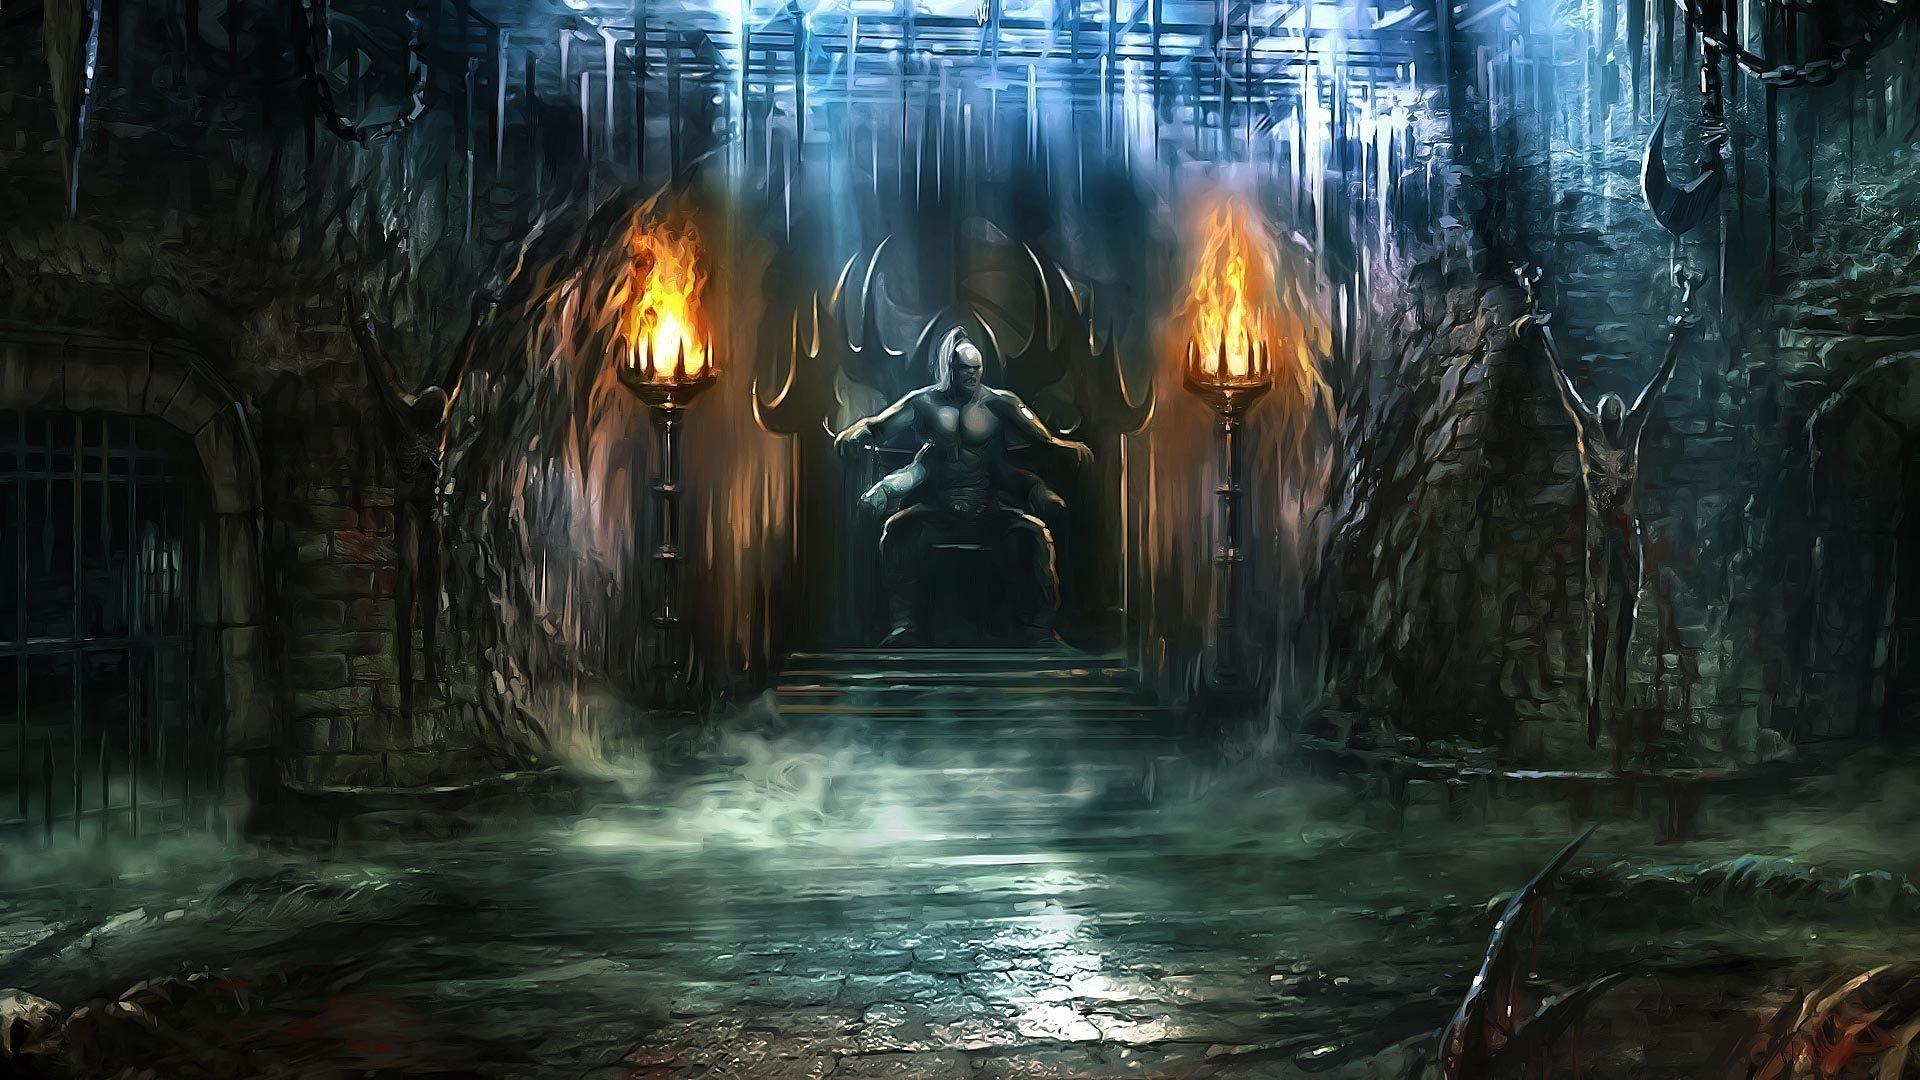 Video Game - Mortal Kombat  Wallpaper